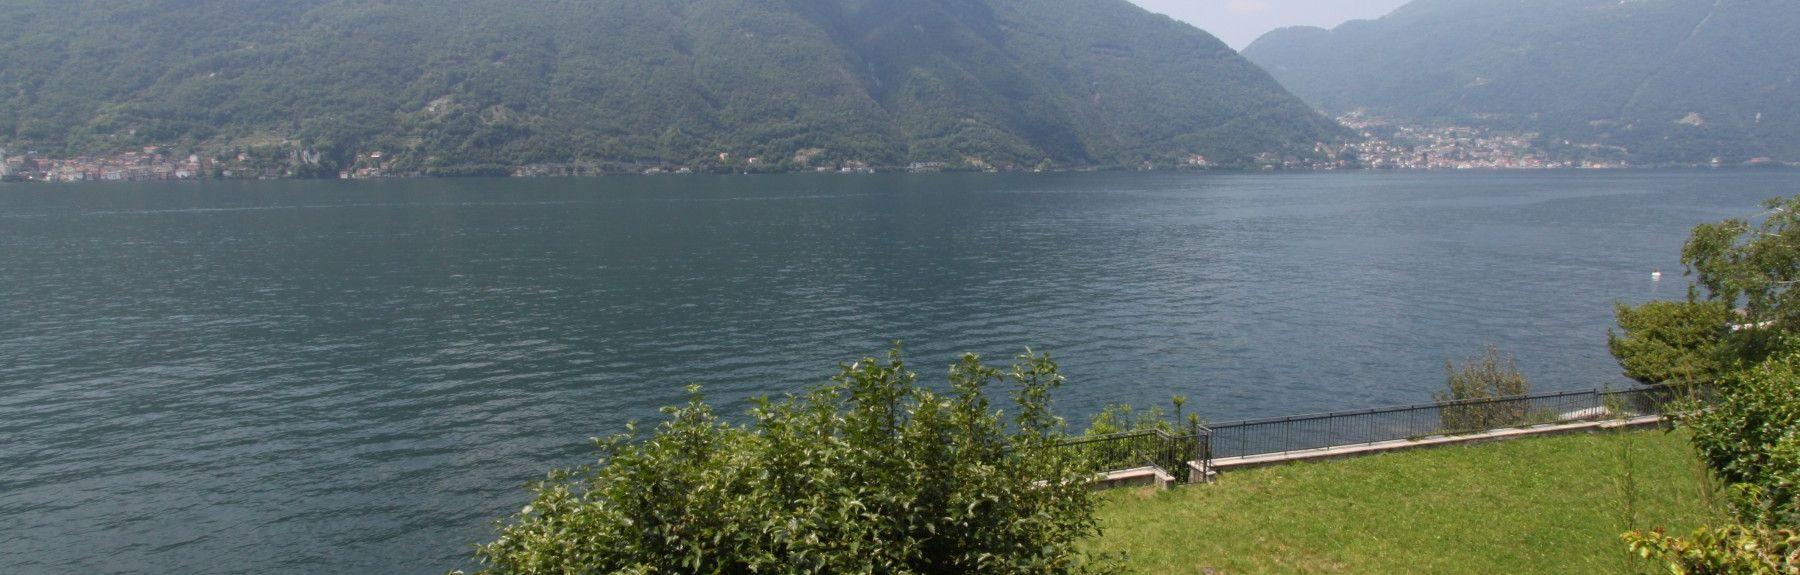 Cerano d'Intelvi, Lombardie, Italie